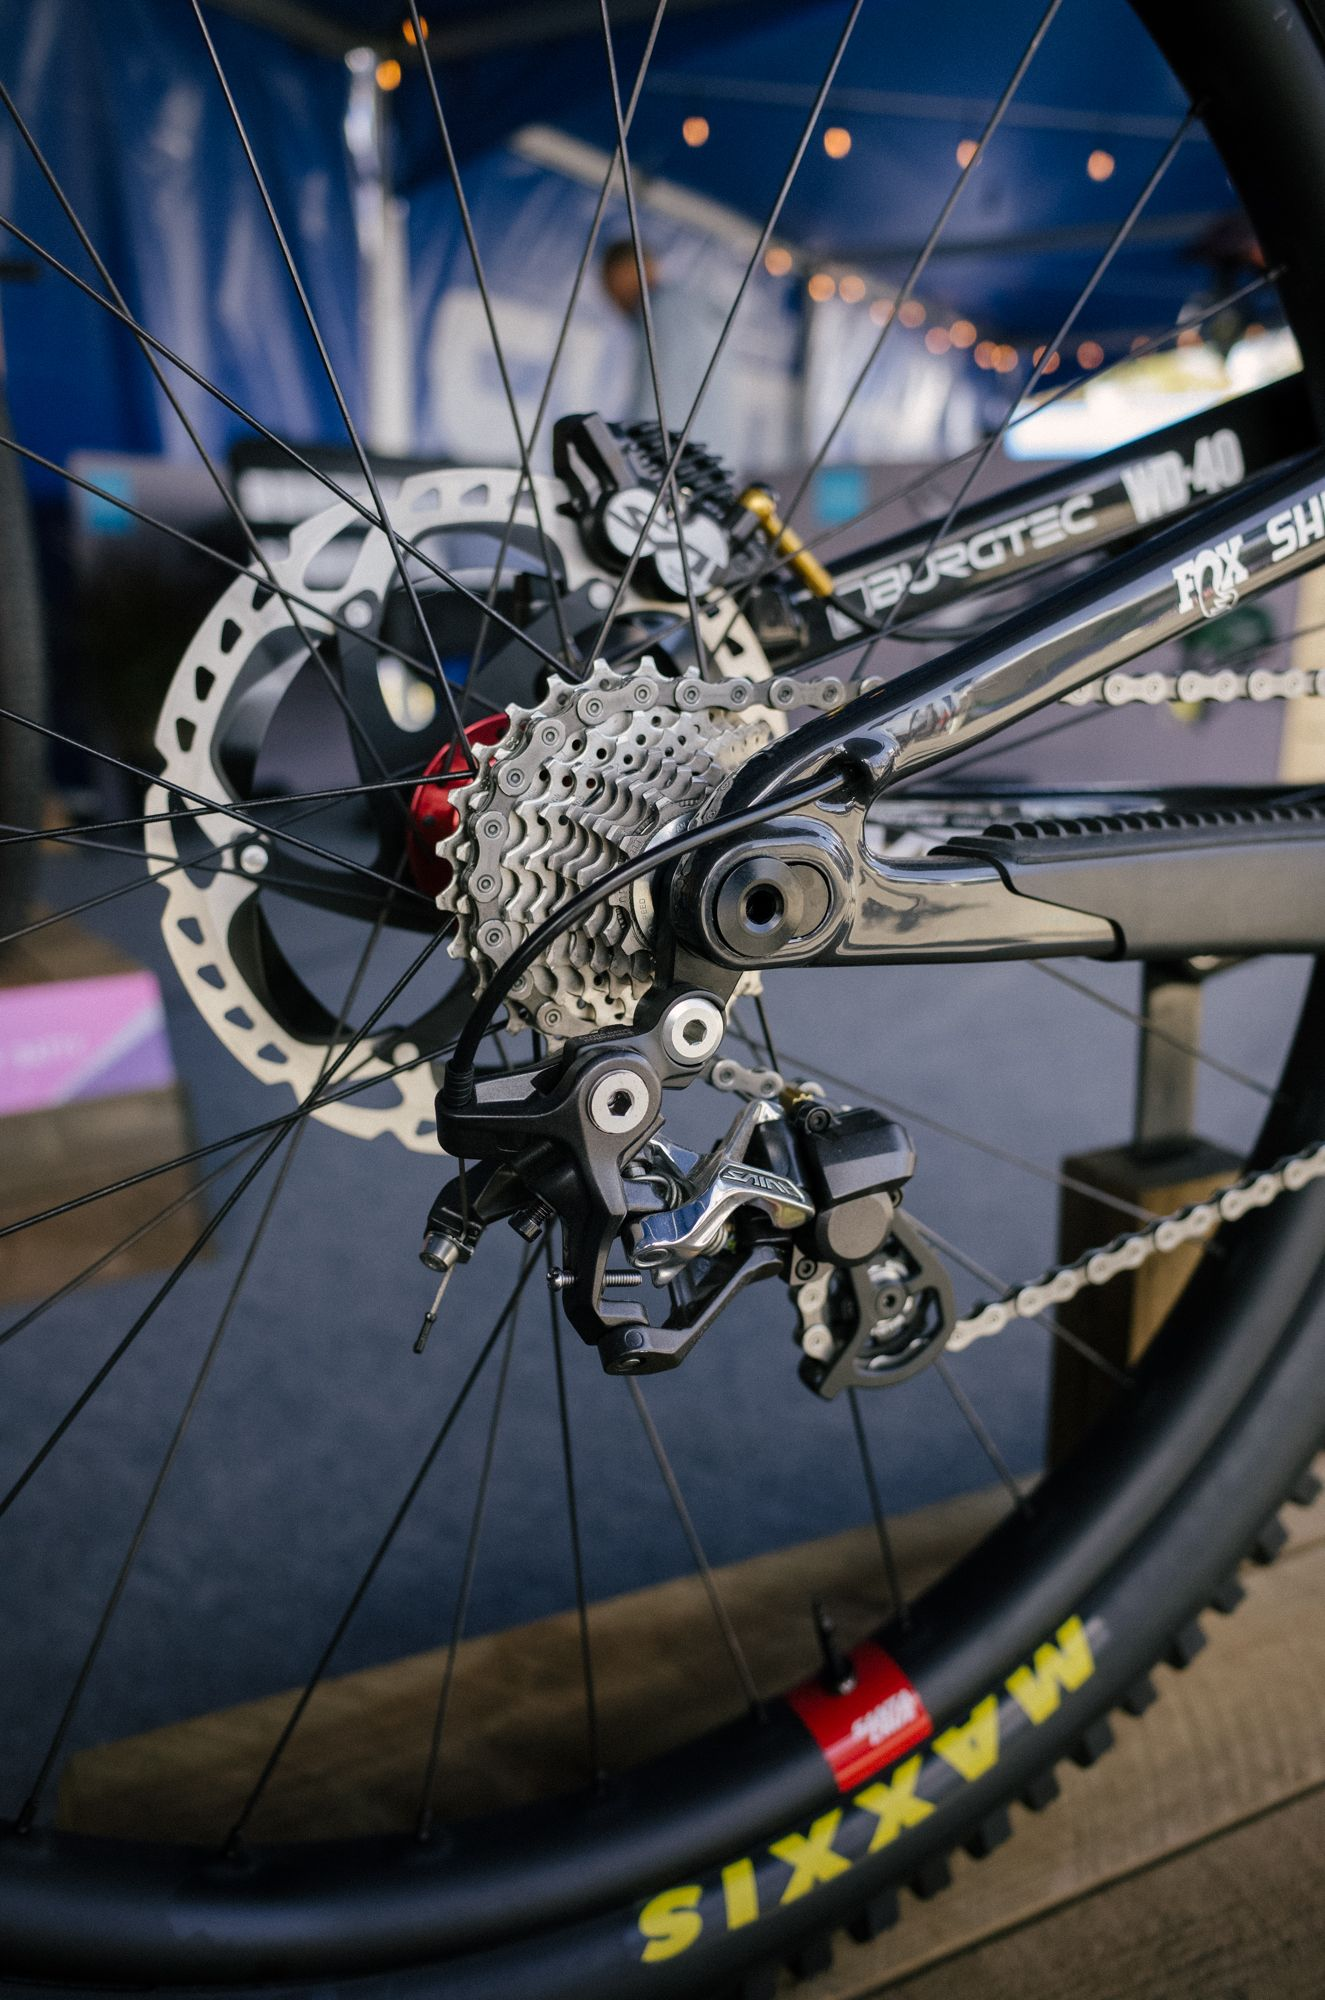 Greg Minnaars bike race bike is only meant to go fast downhill.